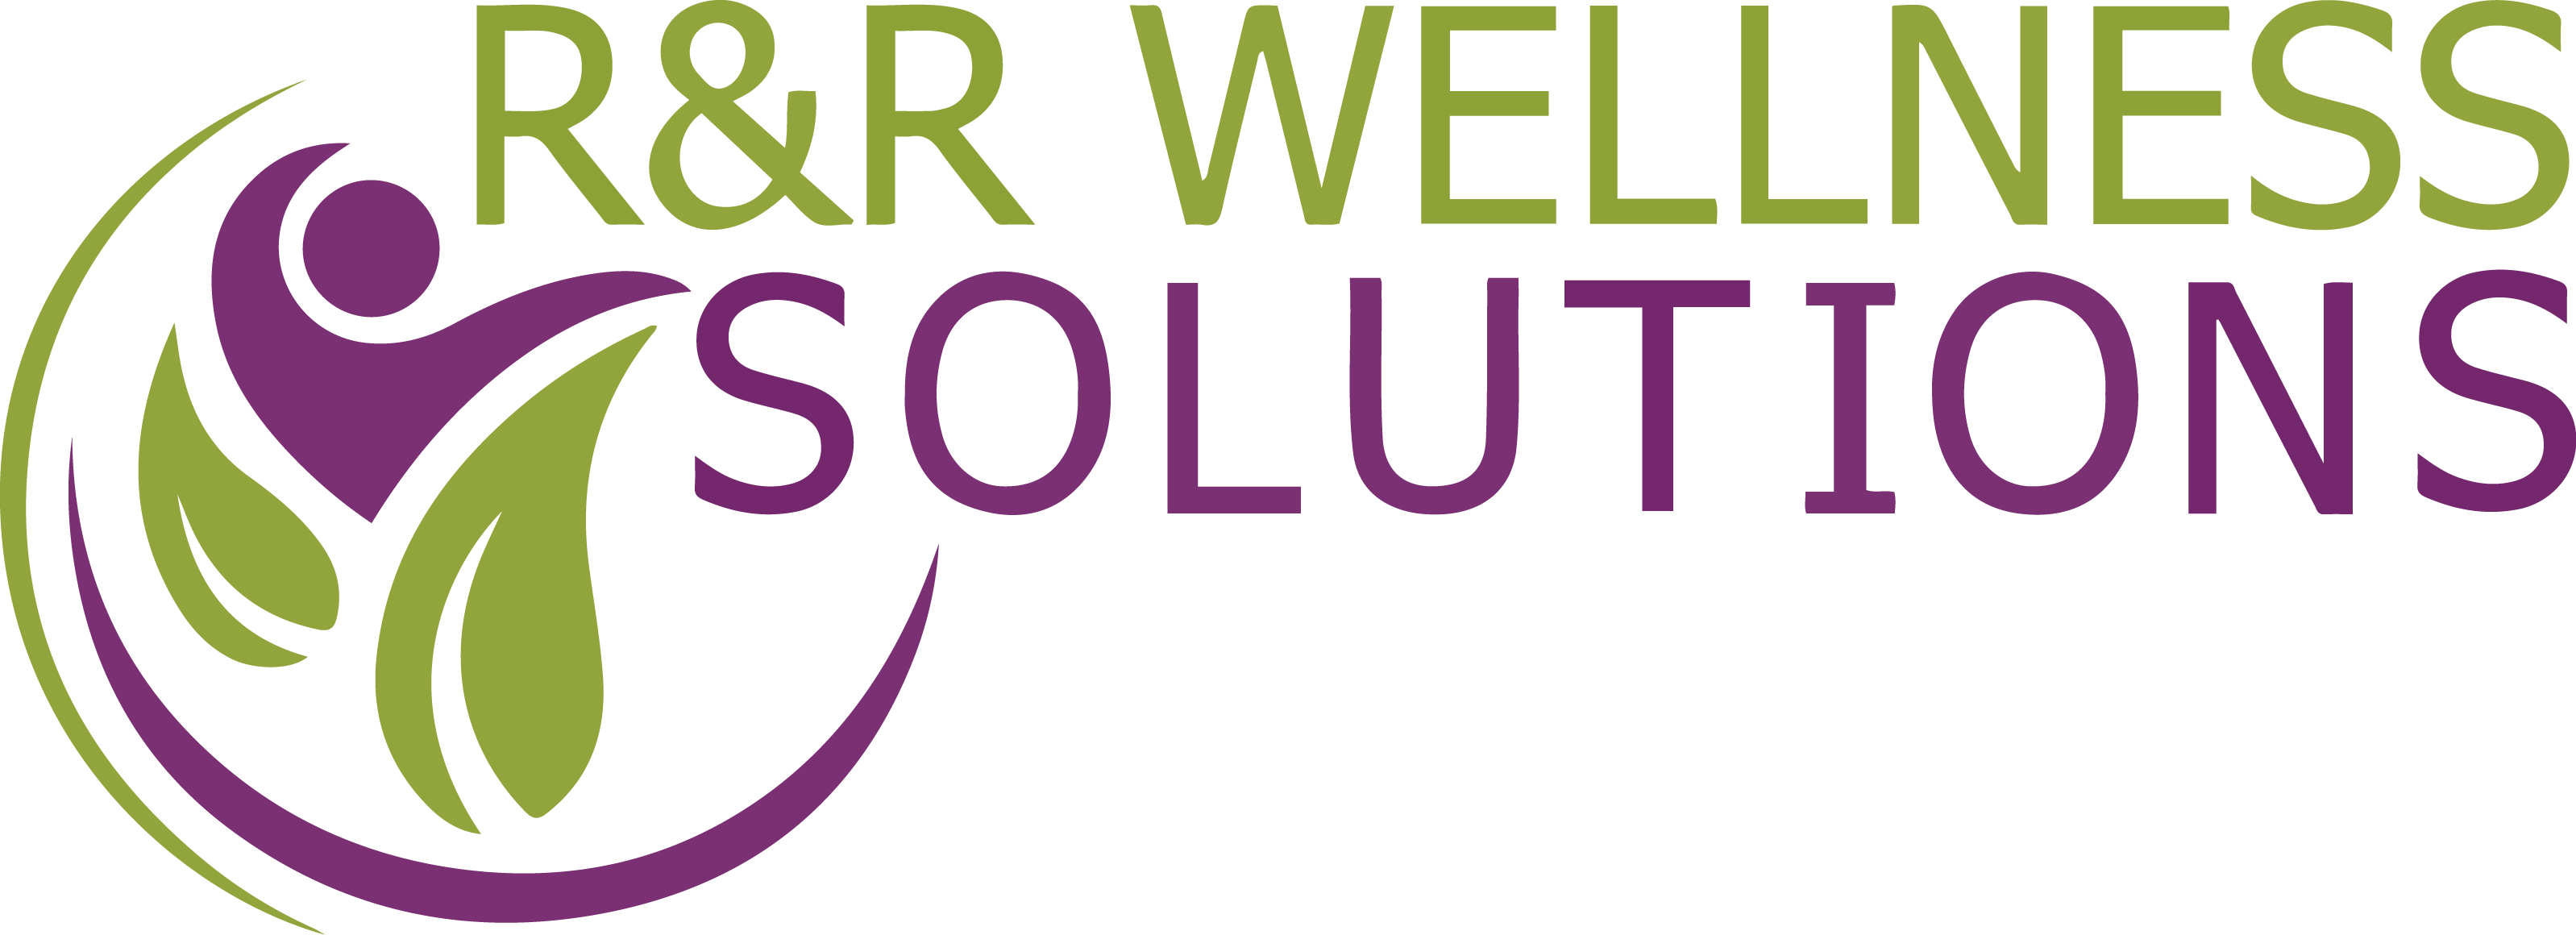 R&R Wellness Solutions